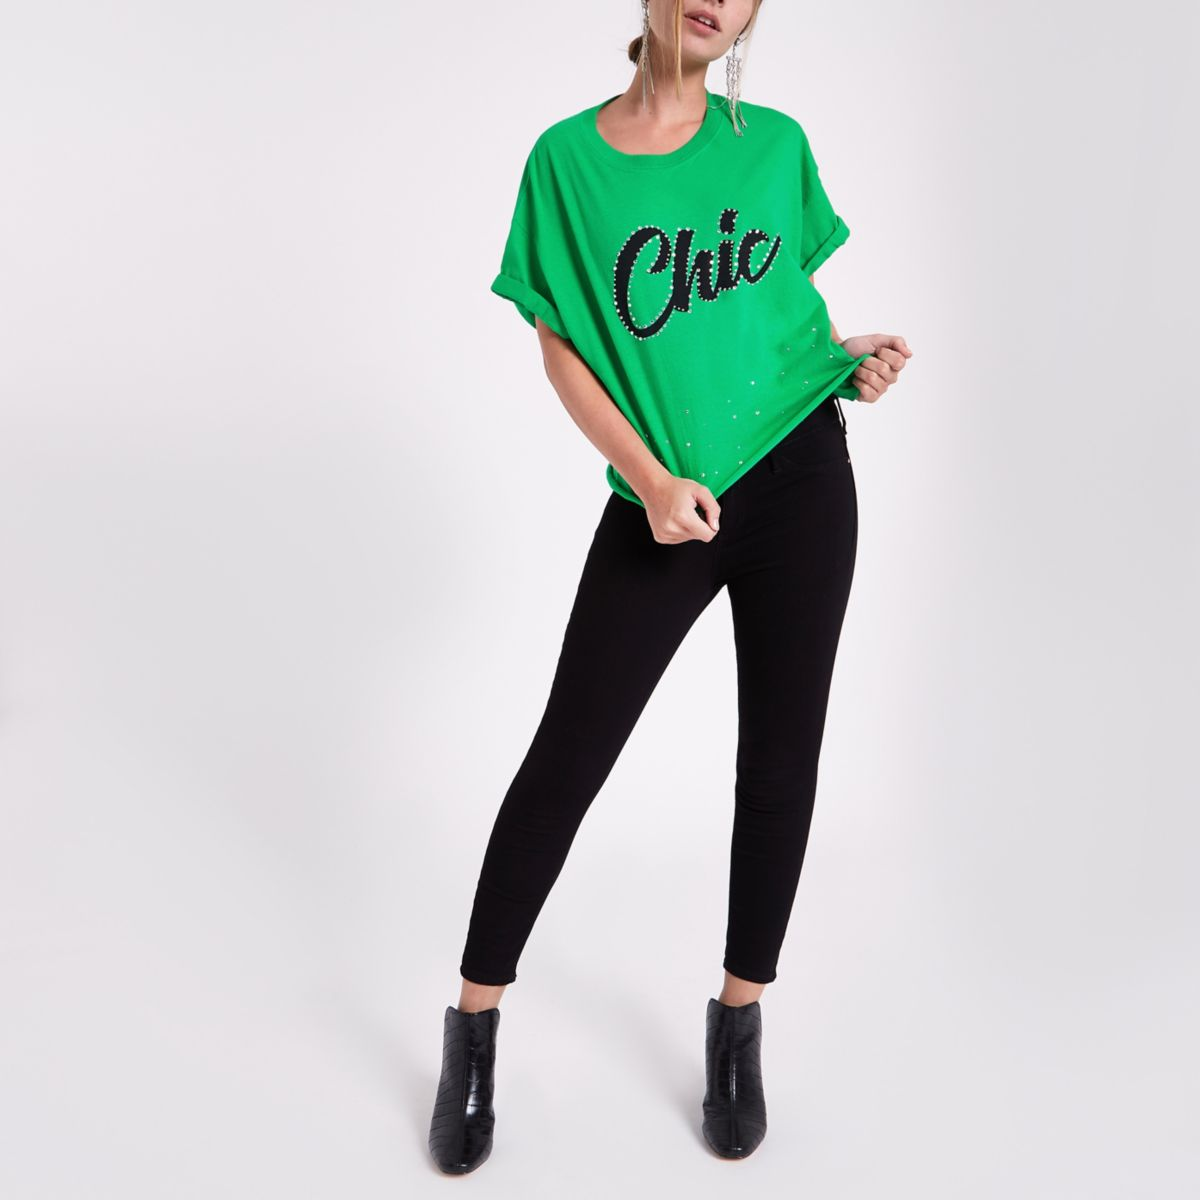 Petite green 'chic' diamante cropped T-shirt